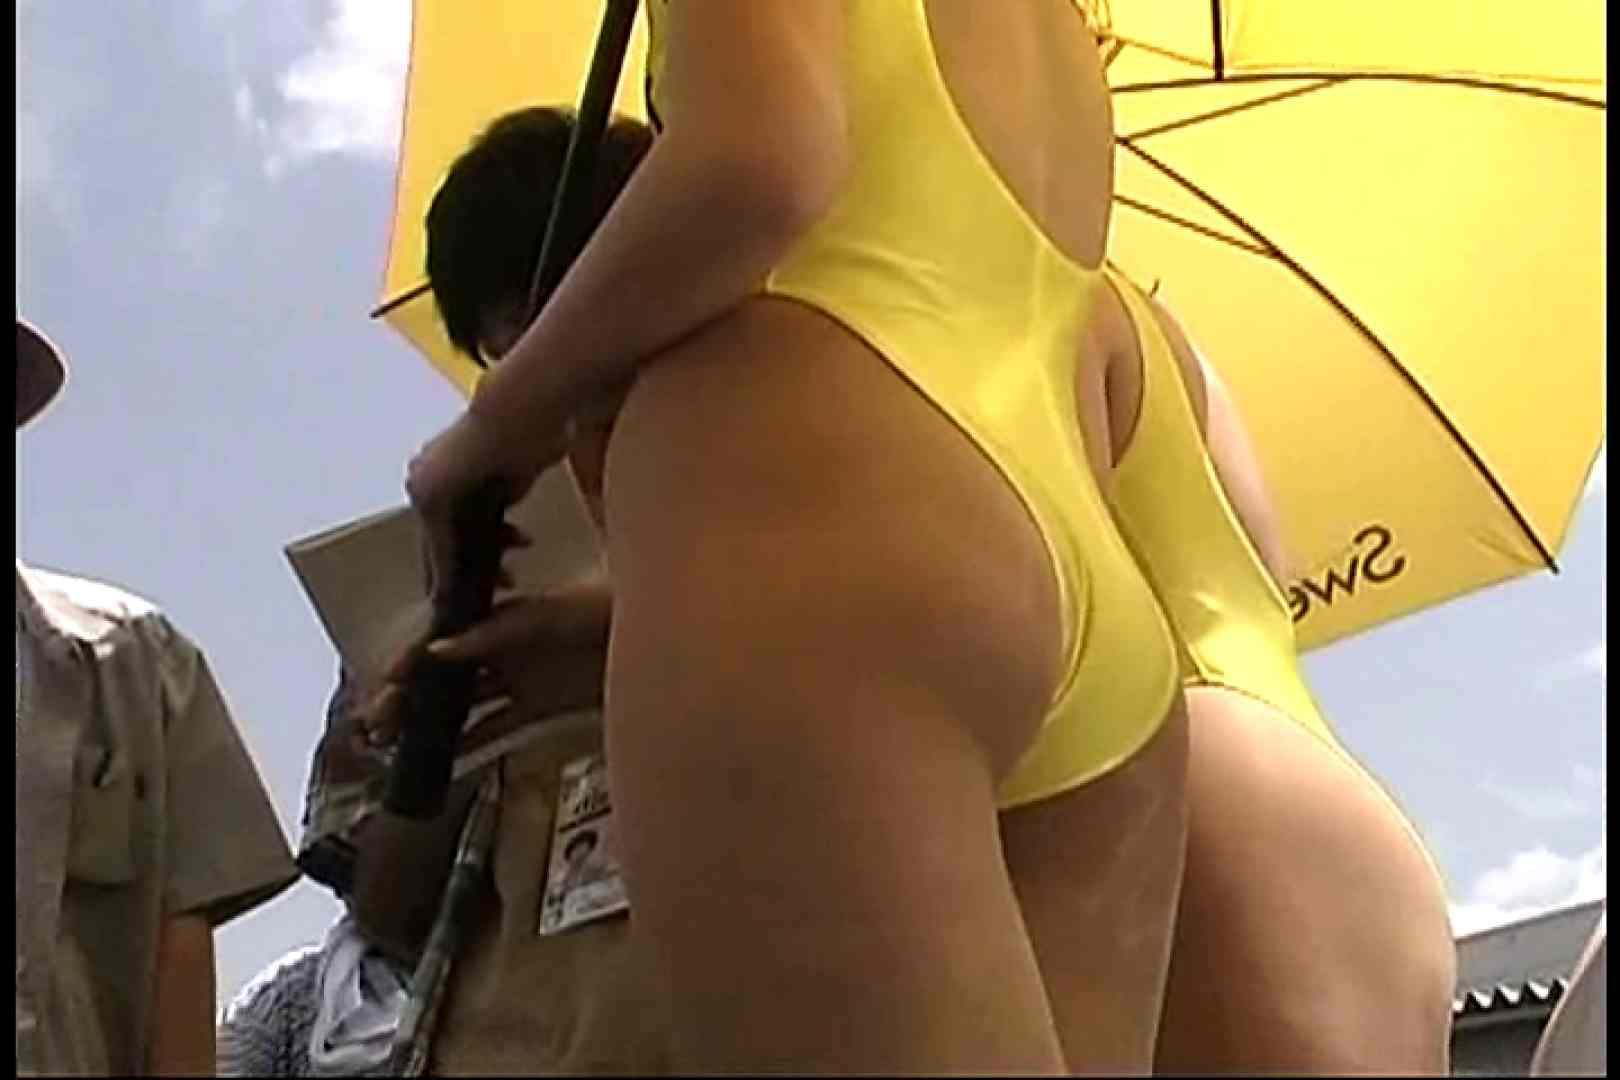 RQカメラ地獄Vol.7 レースクイーン | OLの実態  85pic 83